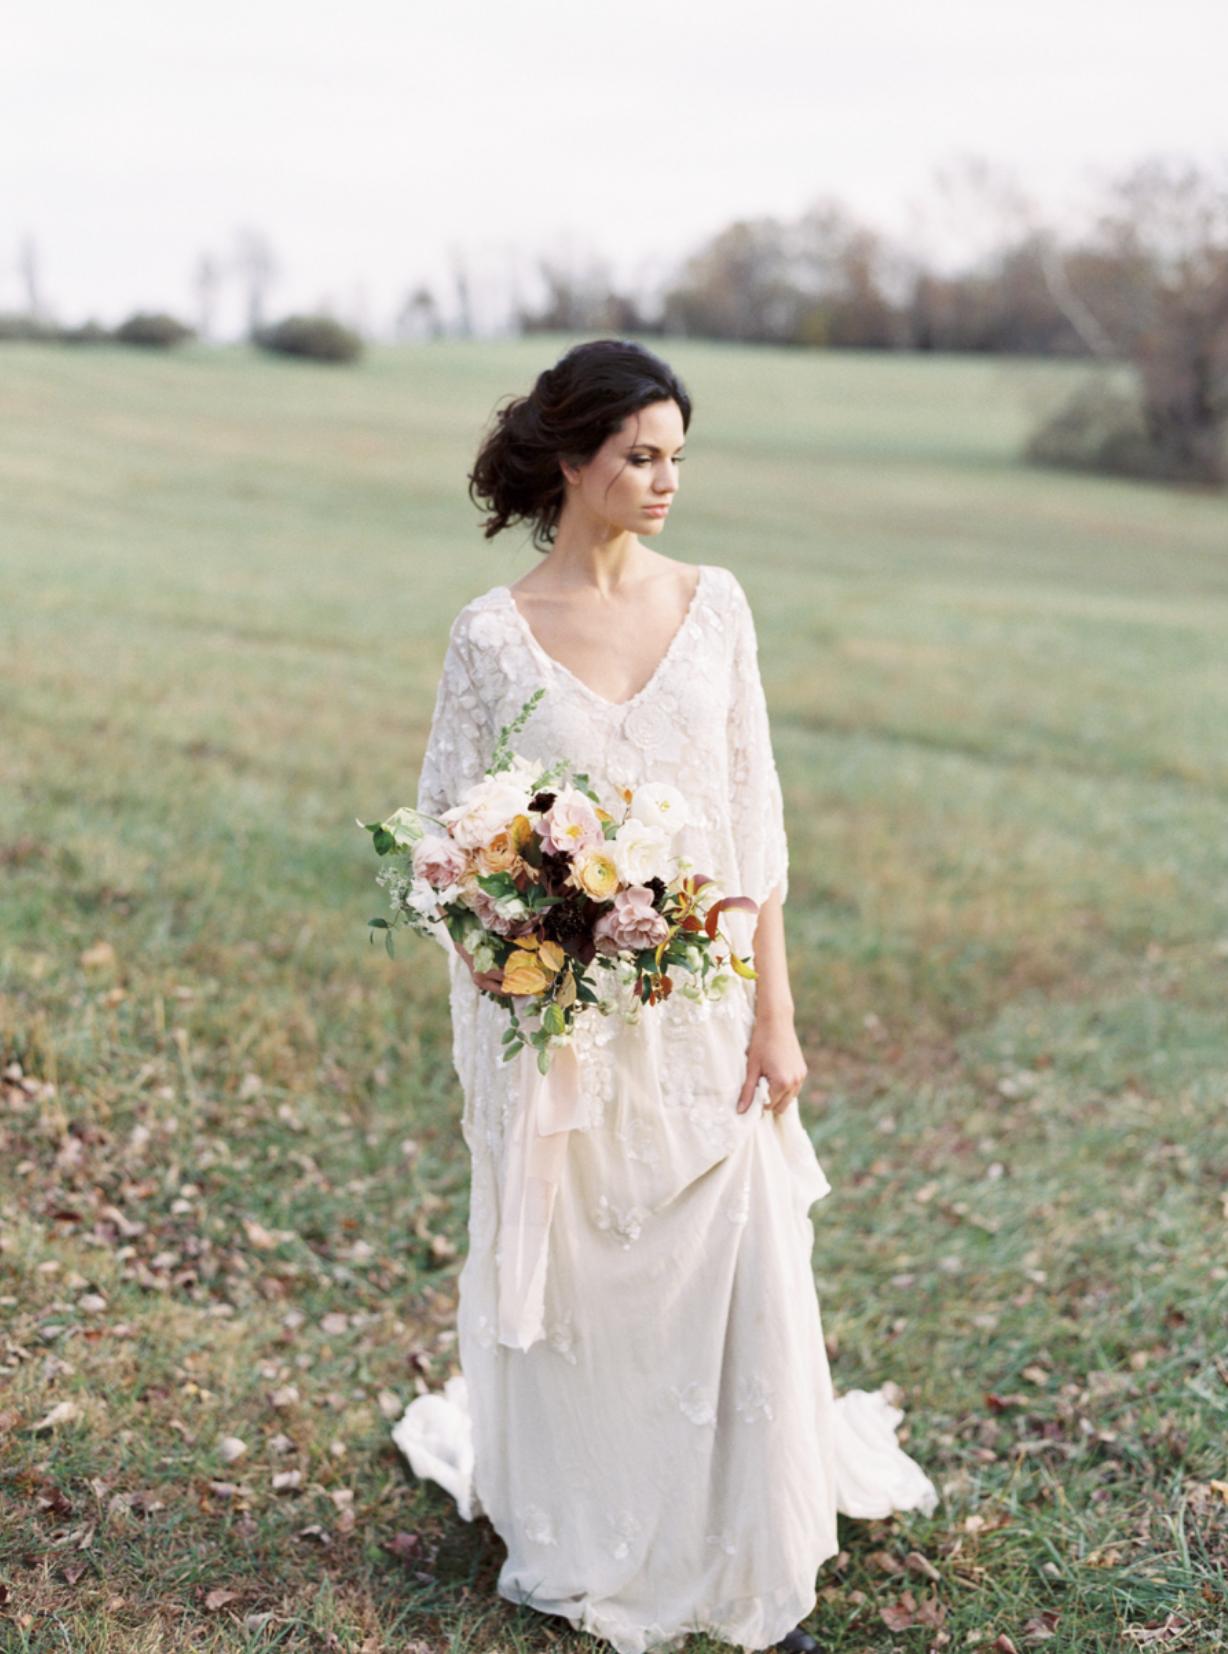 Carol Hannah Bridal Iolite Gown Shanon Moffit Photography 20.png